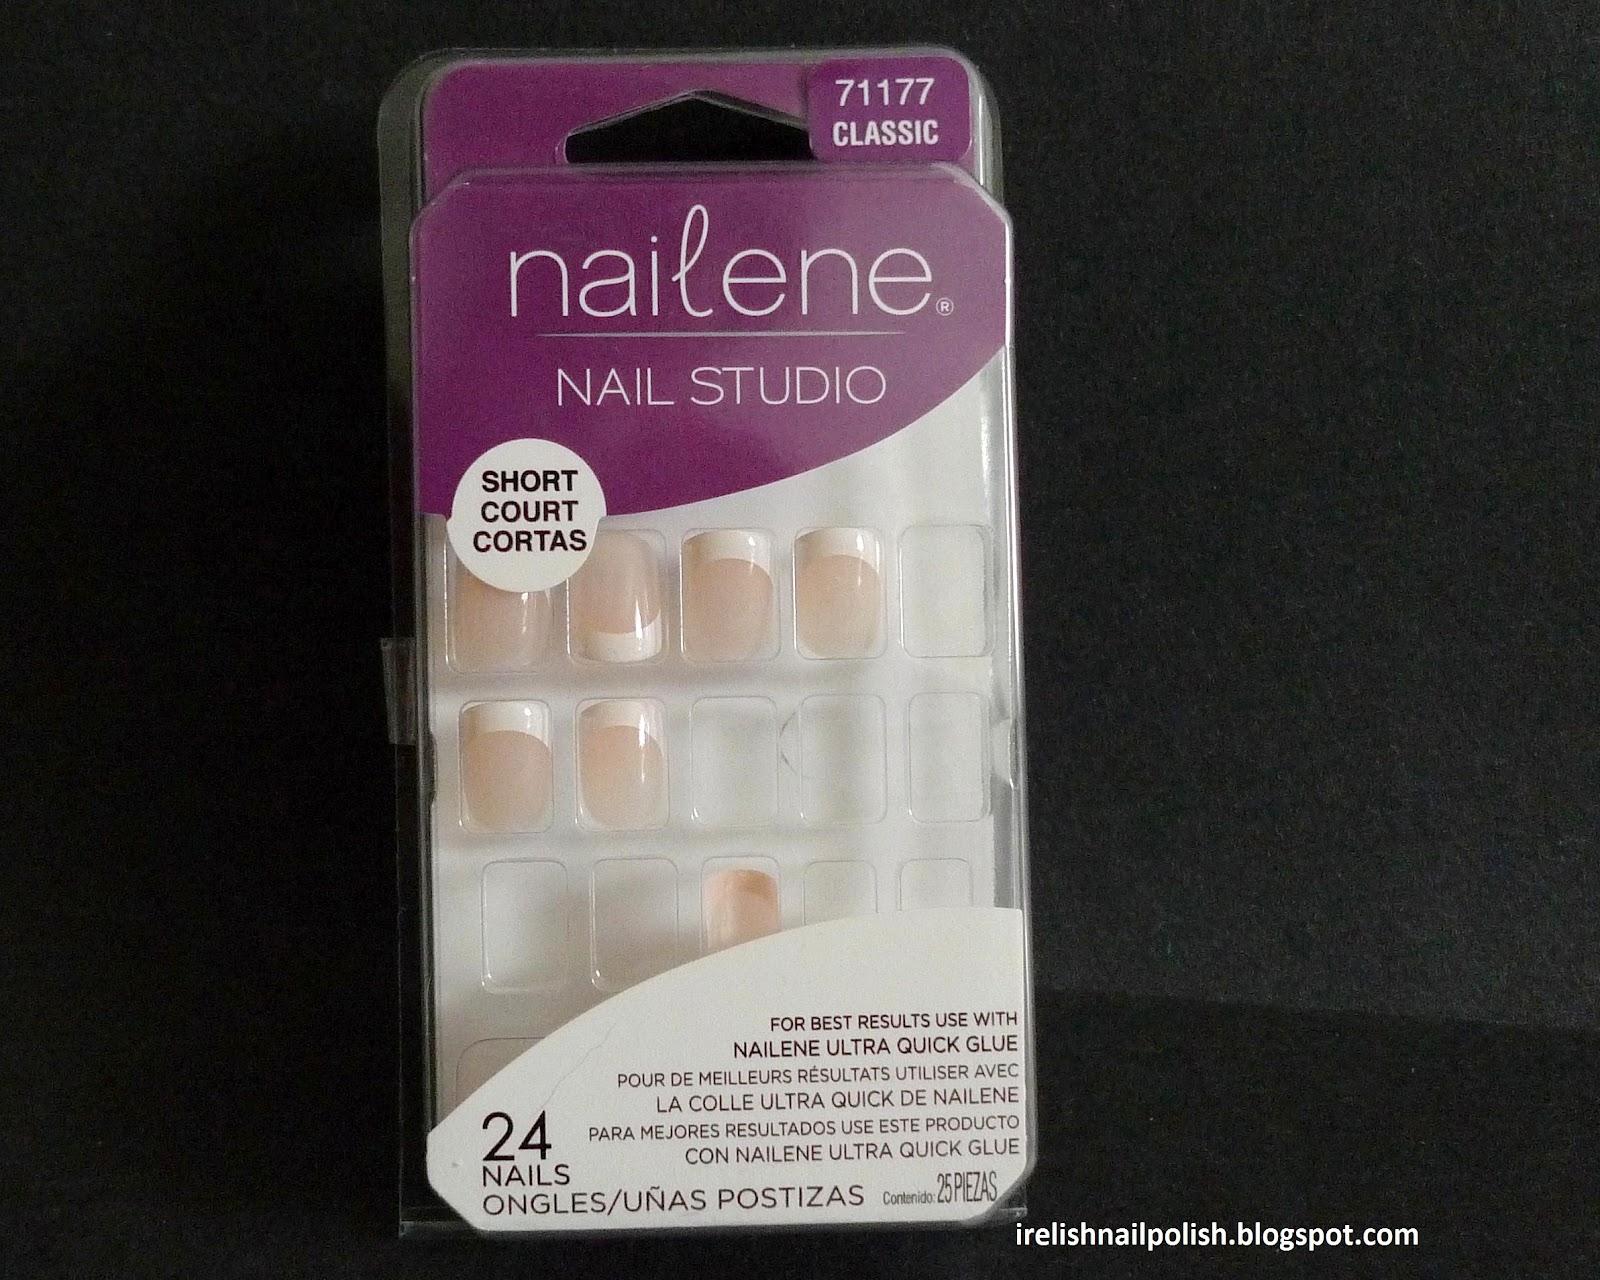 I Relish Nail Polish!: Nailene Fake Artificial Drugstore French Nails